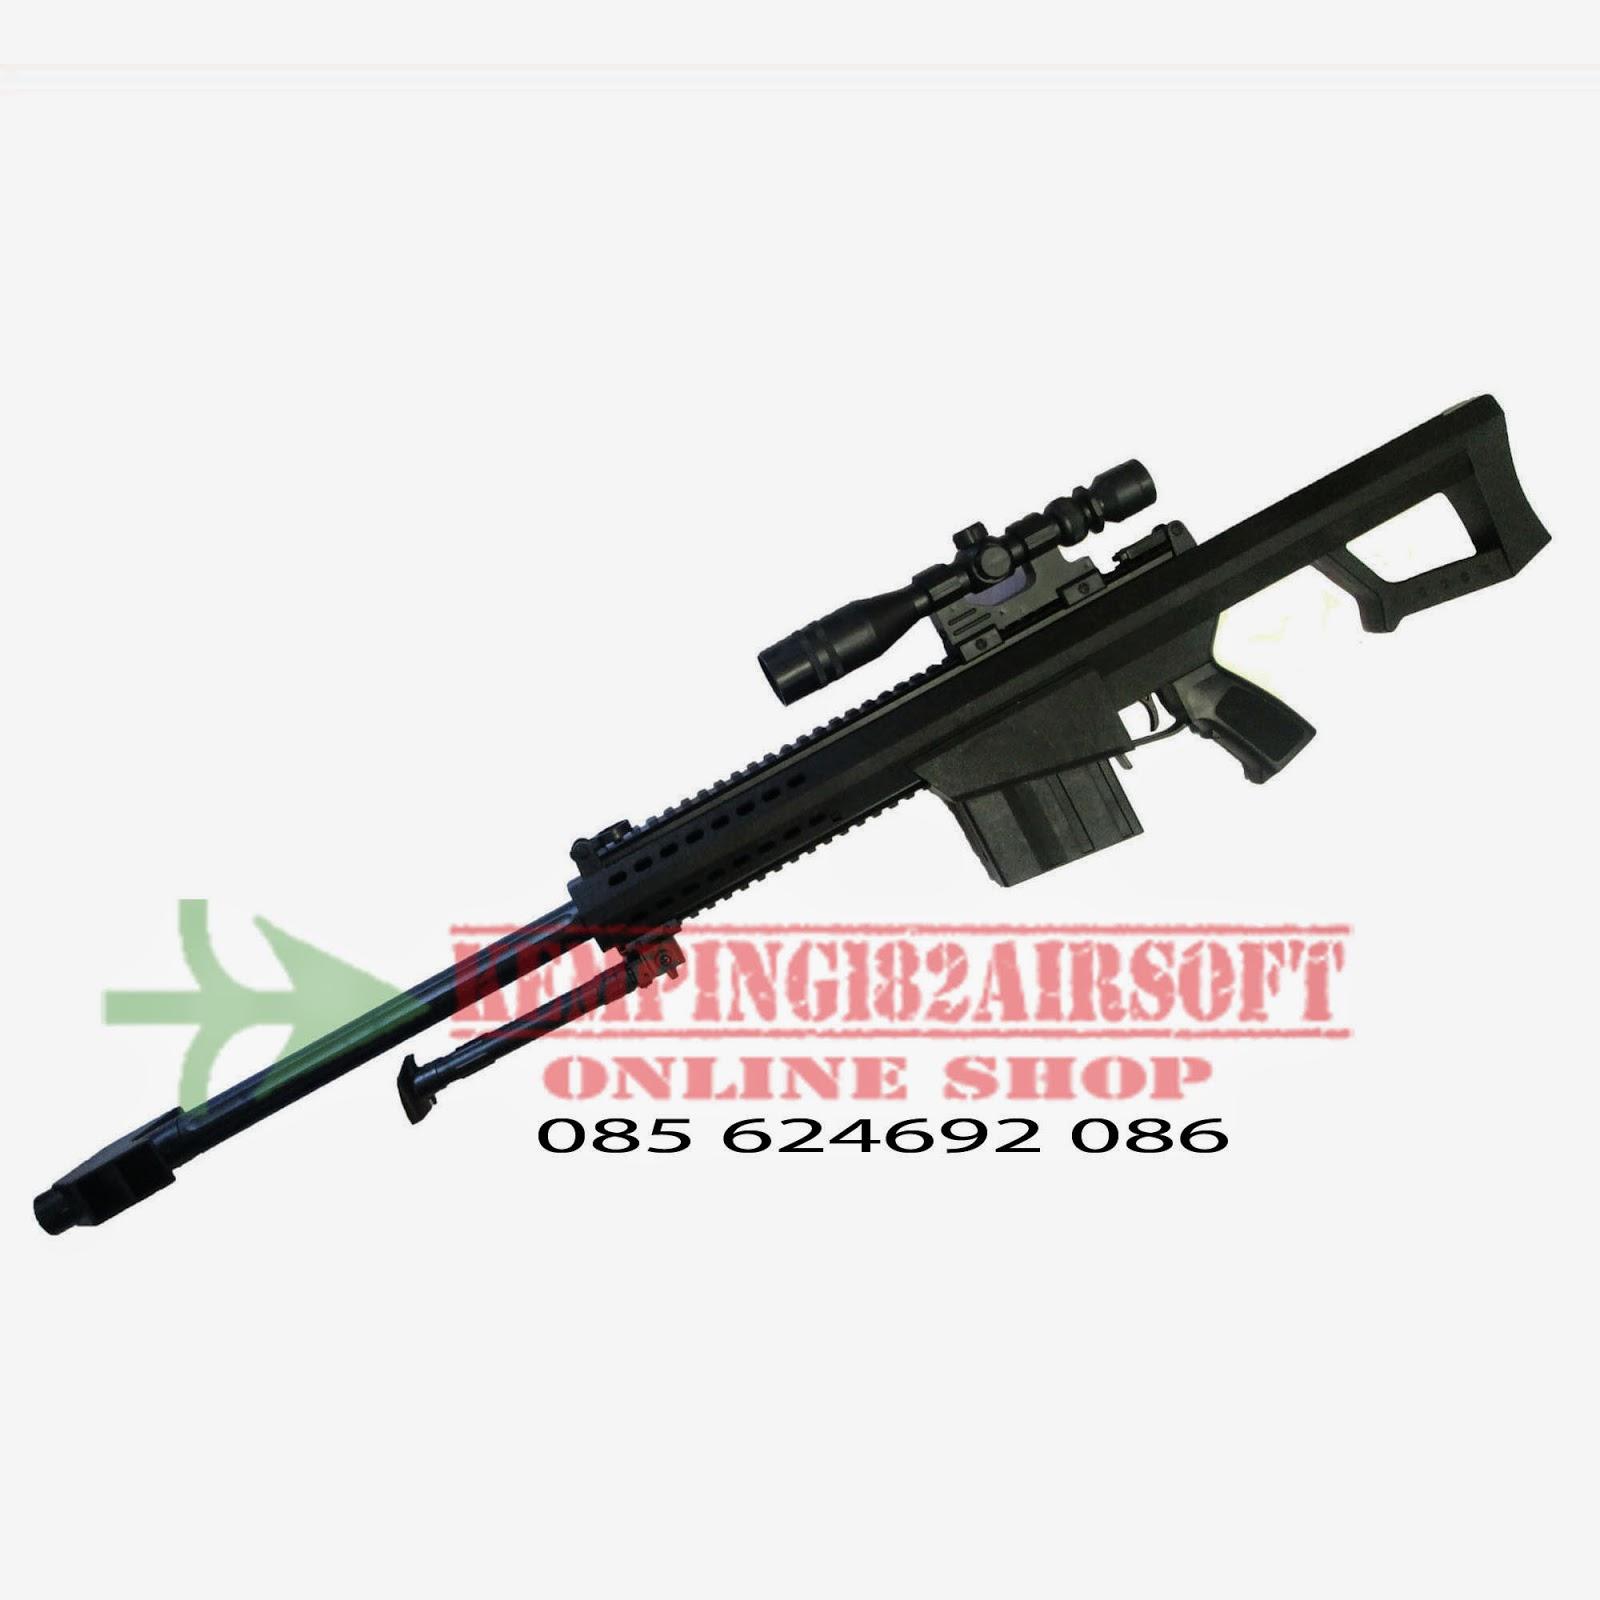 airsoft, spring, sniper, barret m82, sharpshooter